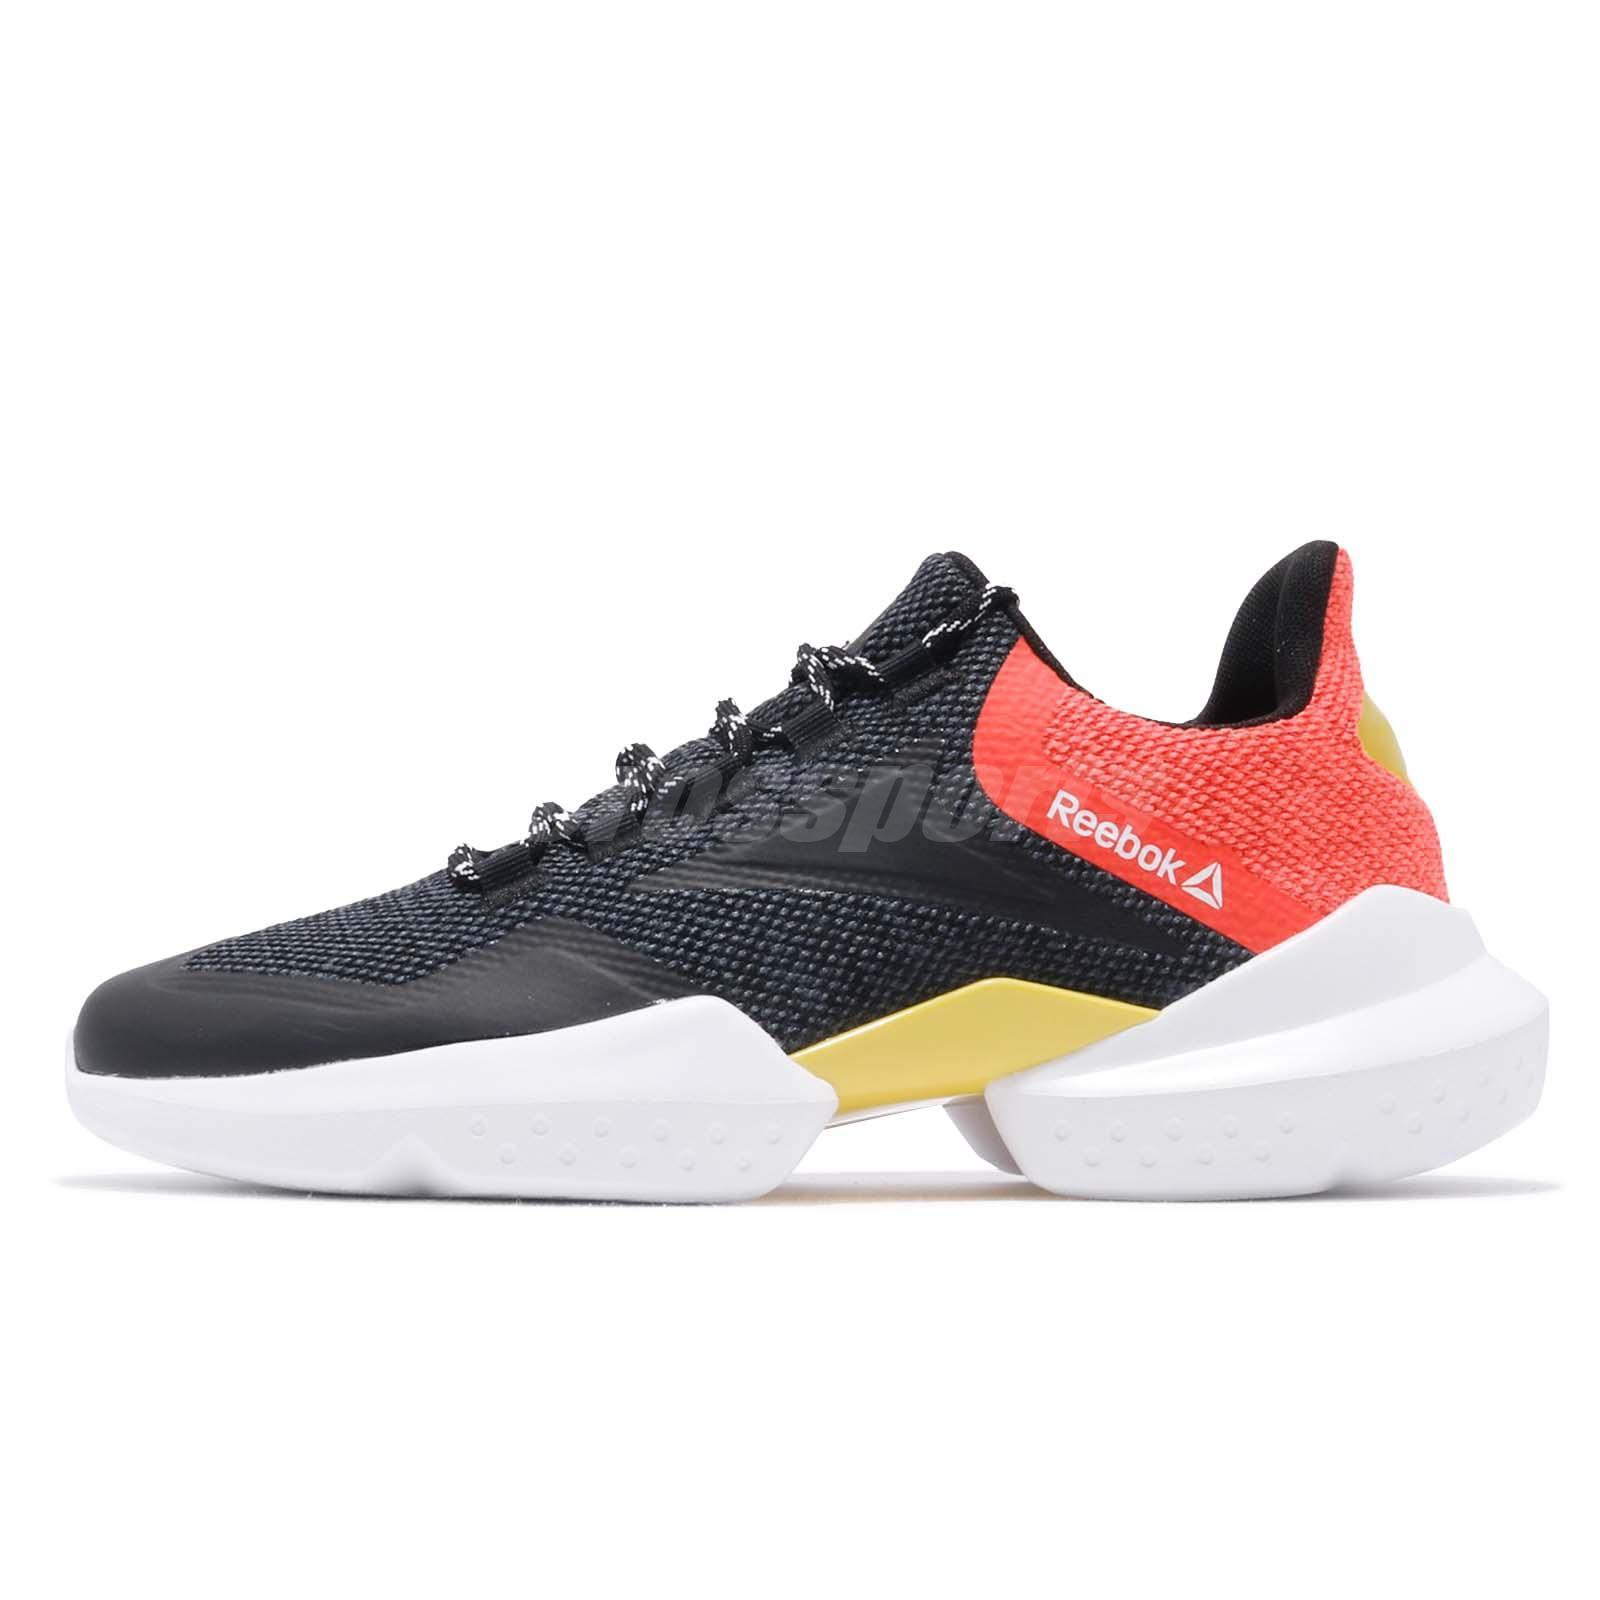 3a1e0b9ce27 Reebok Split Fuel Black White Red Yellow Grey Men Running Shoes Sneakers  DV5450